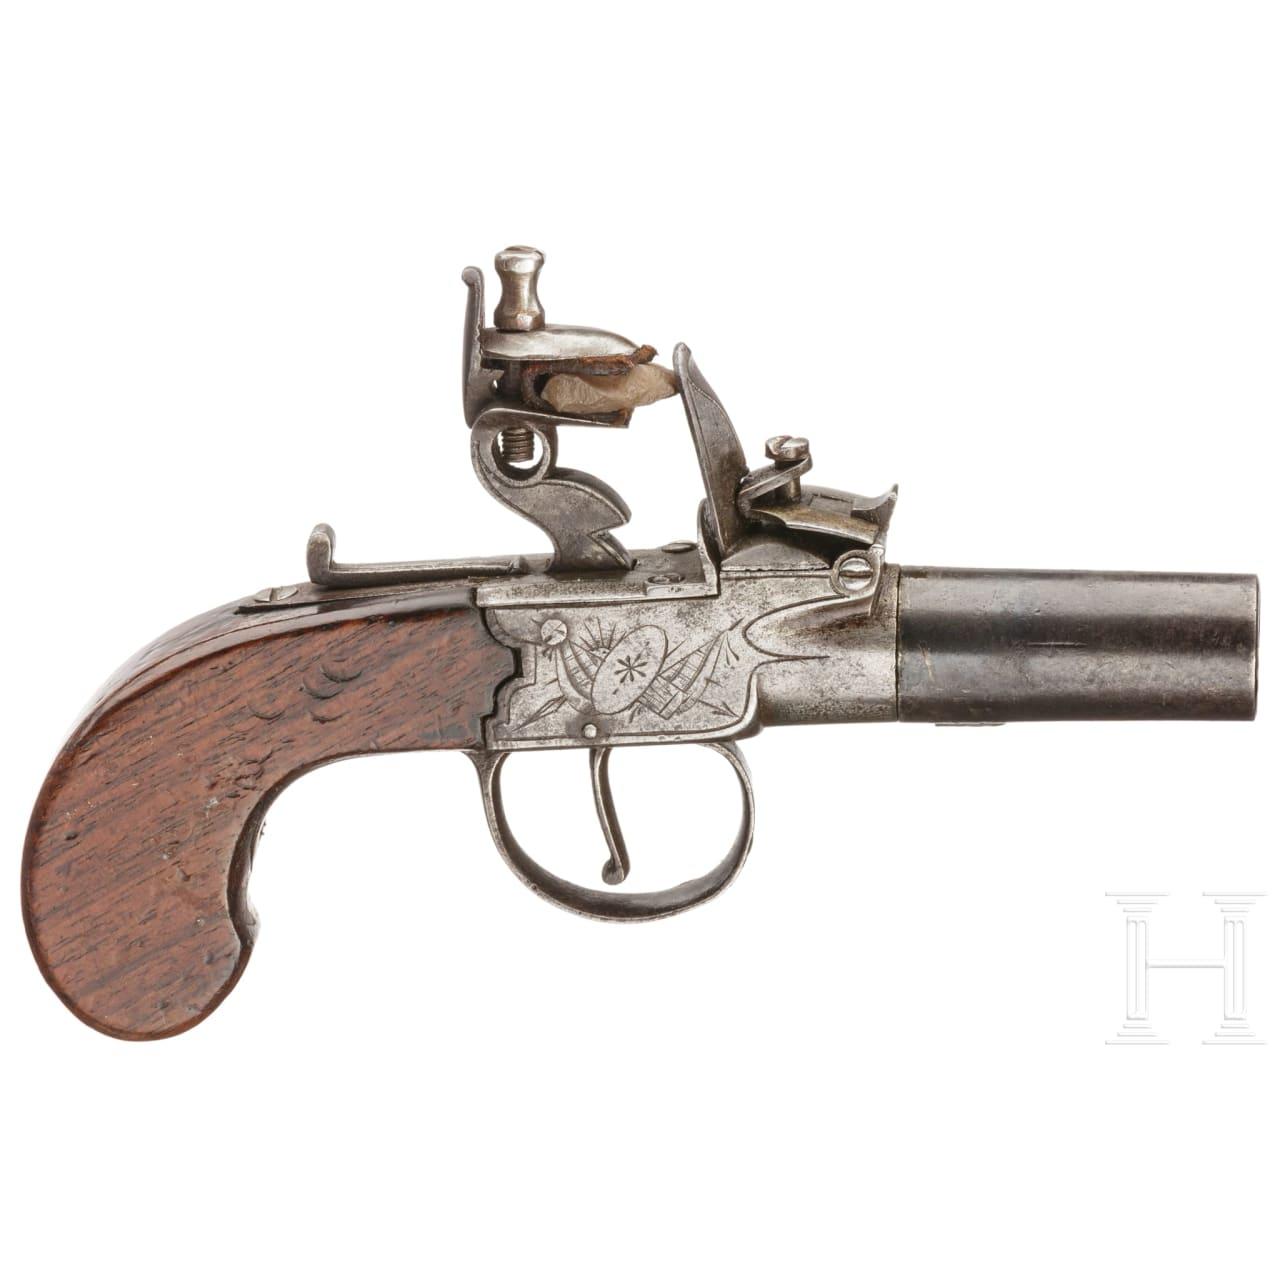 A flintlock pocket pistol by S. Wallis, England, circa 1800